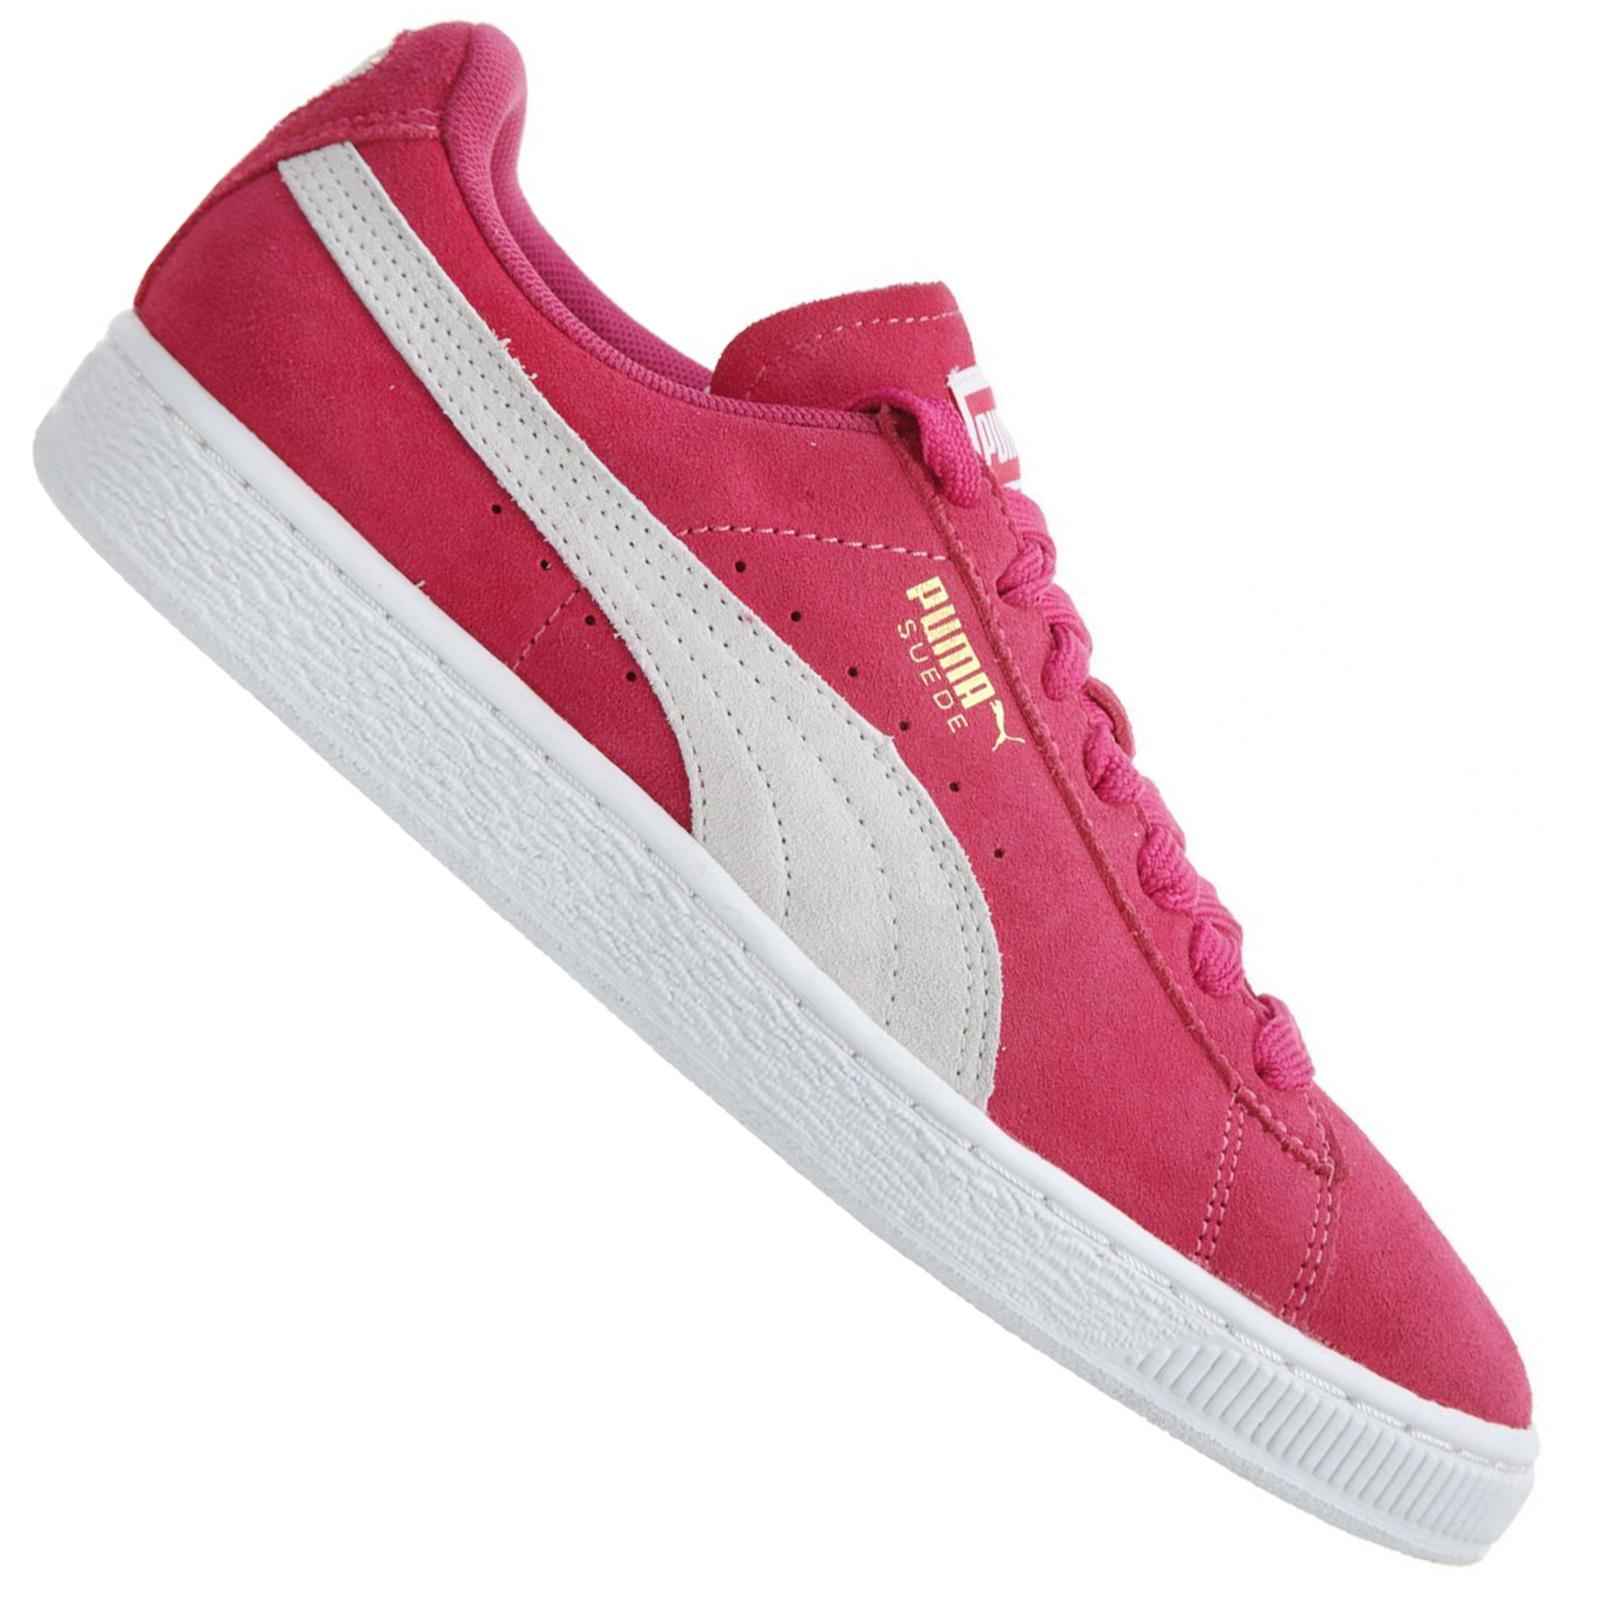 rodar Manifiesto Polvo  puma suede classic pink white - 58% remise - www.ak-hel.com